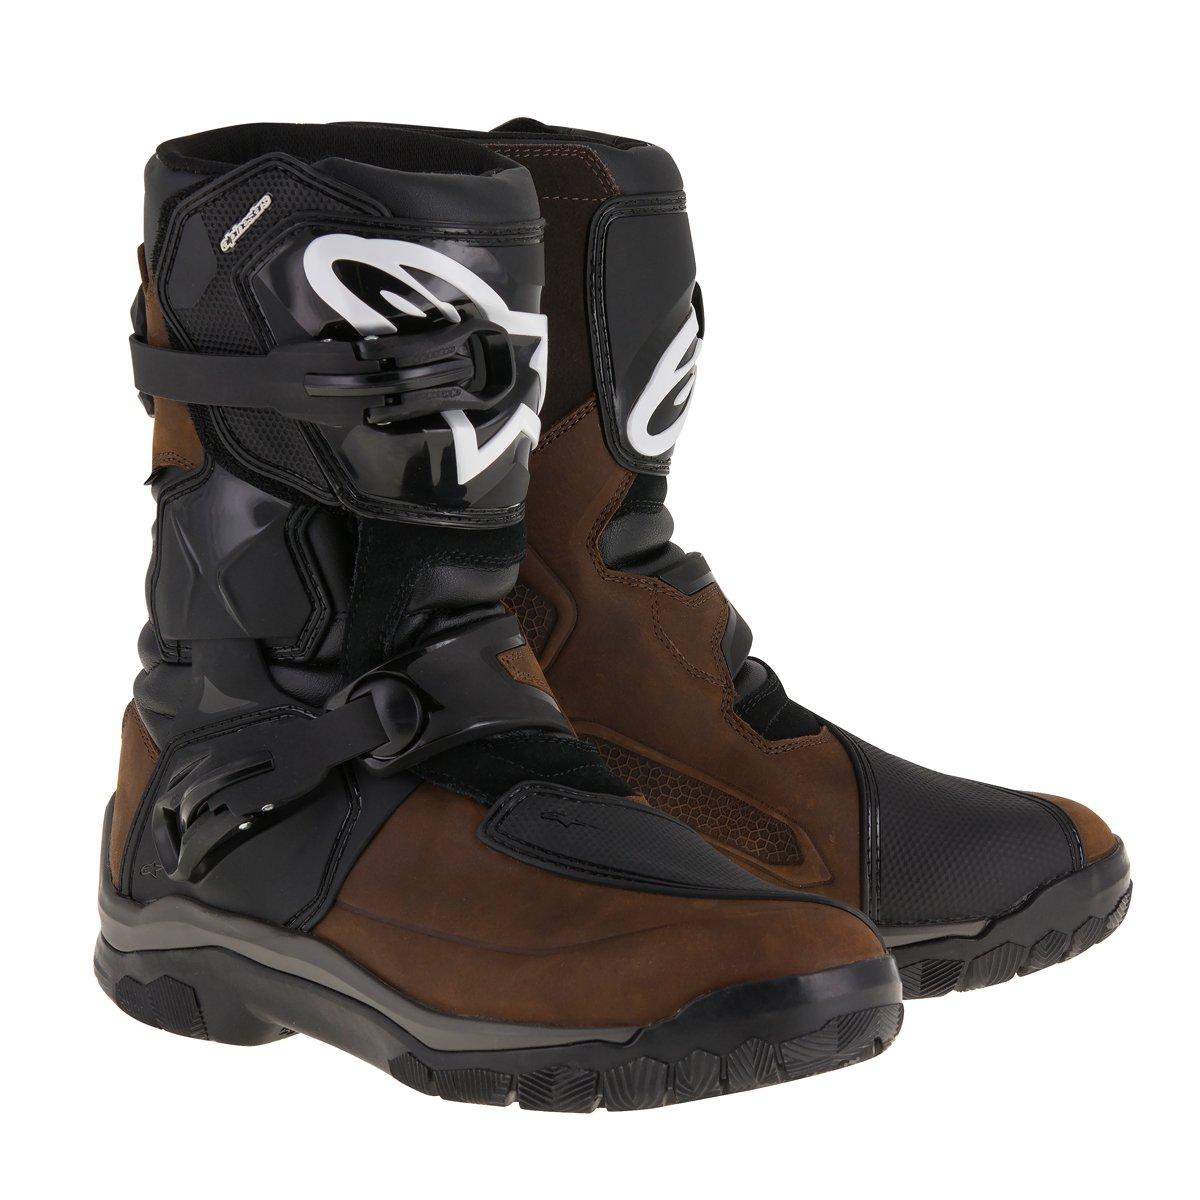 Alpinestars Belize Drystar Men's Street Motorcycle Boots - Brown Oiled Leather / 11